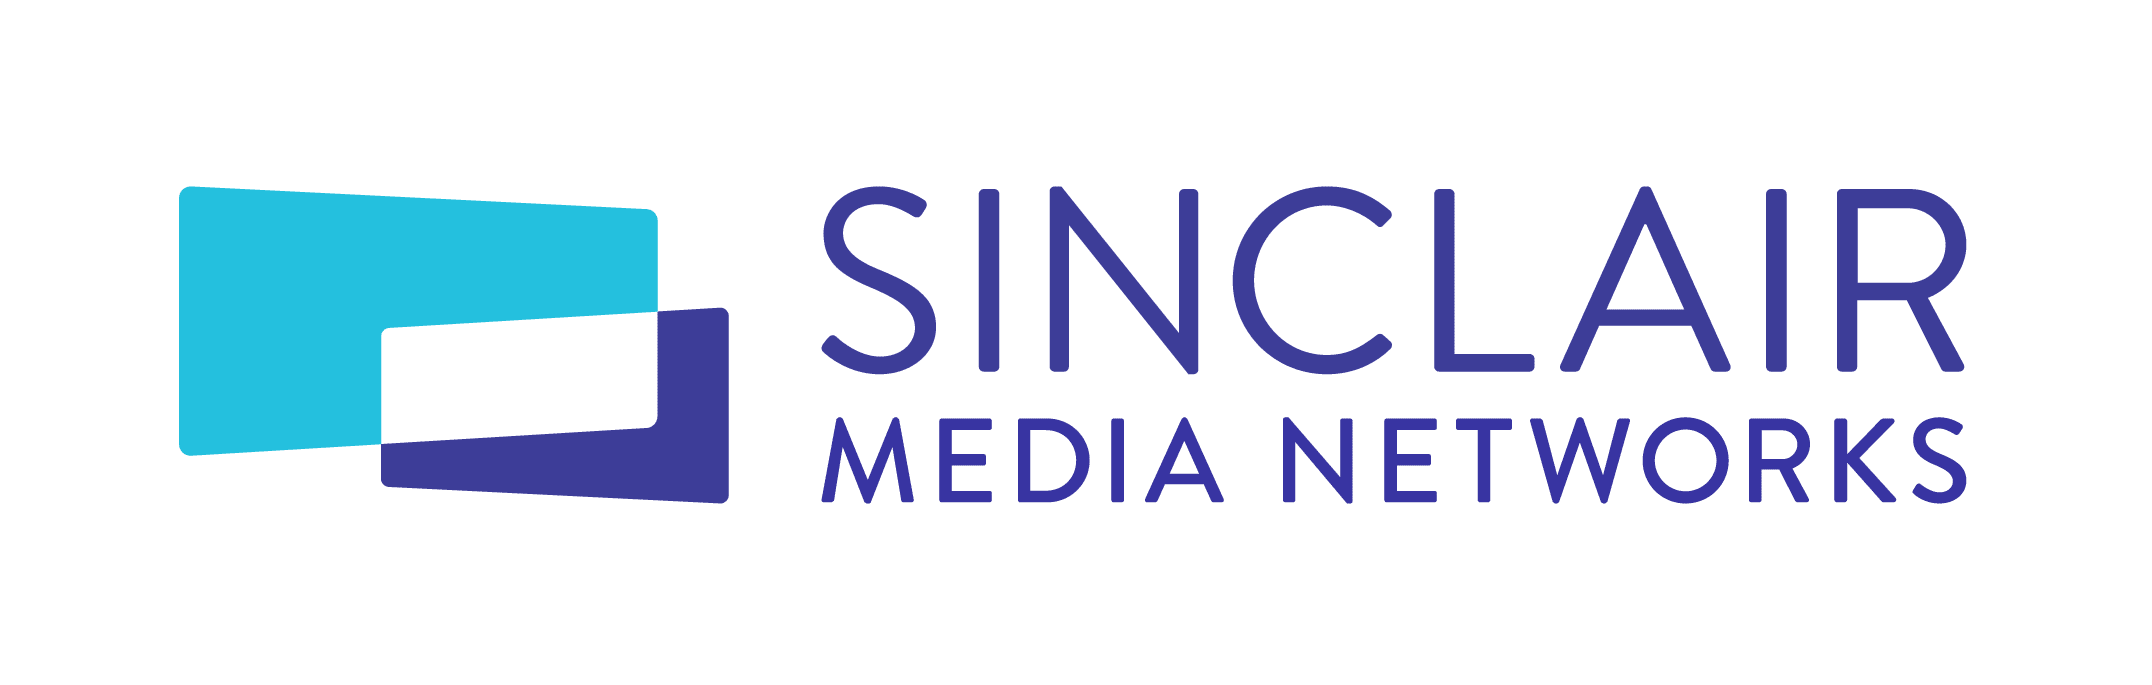 Sinclair Media Networks